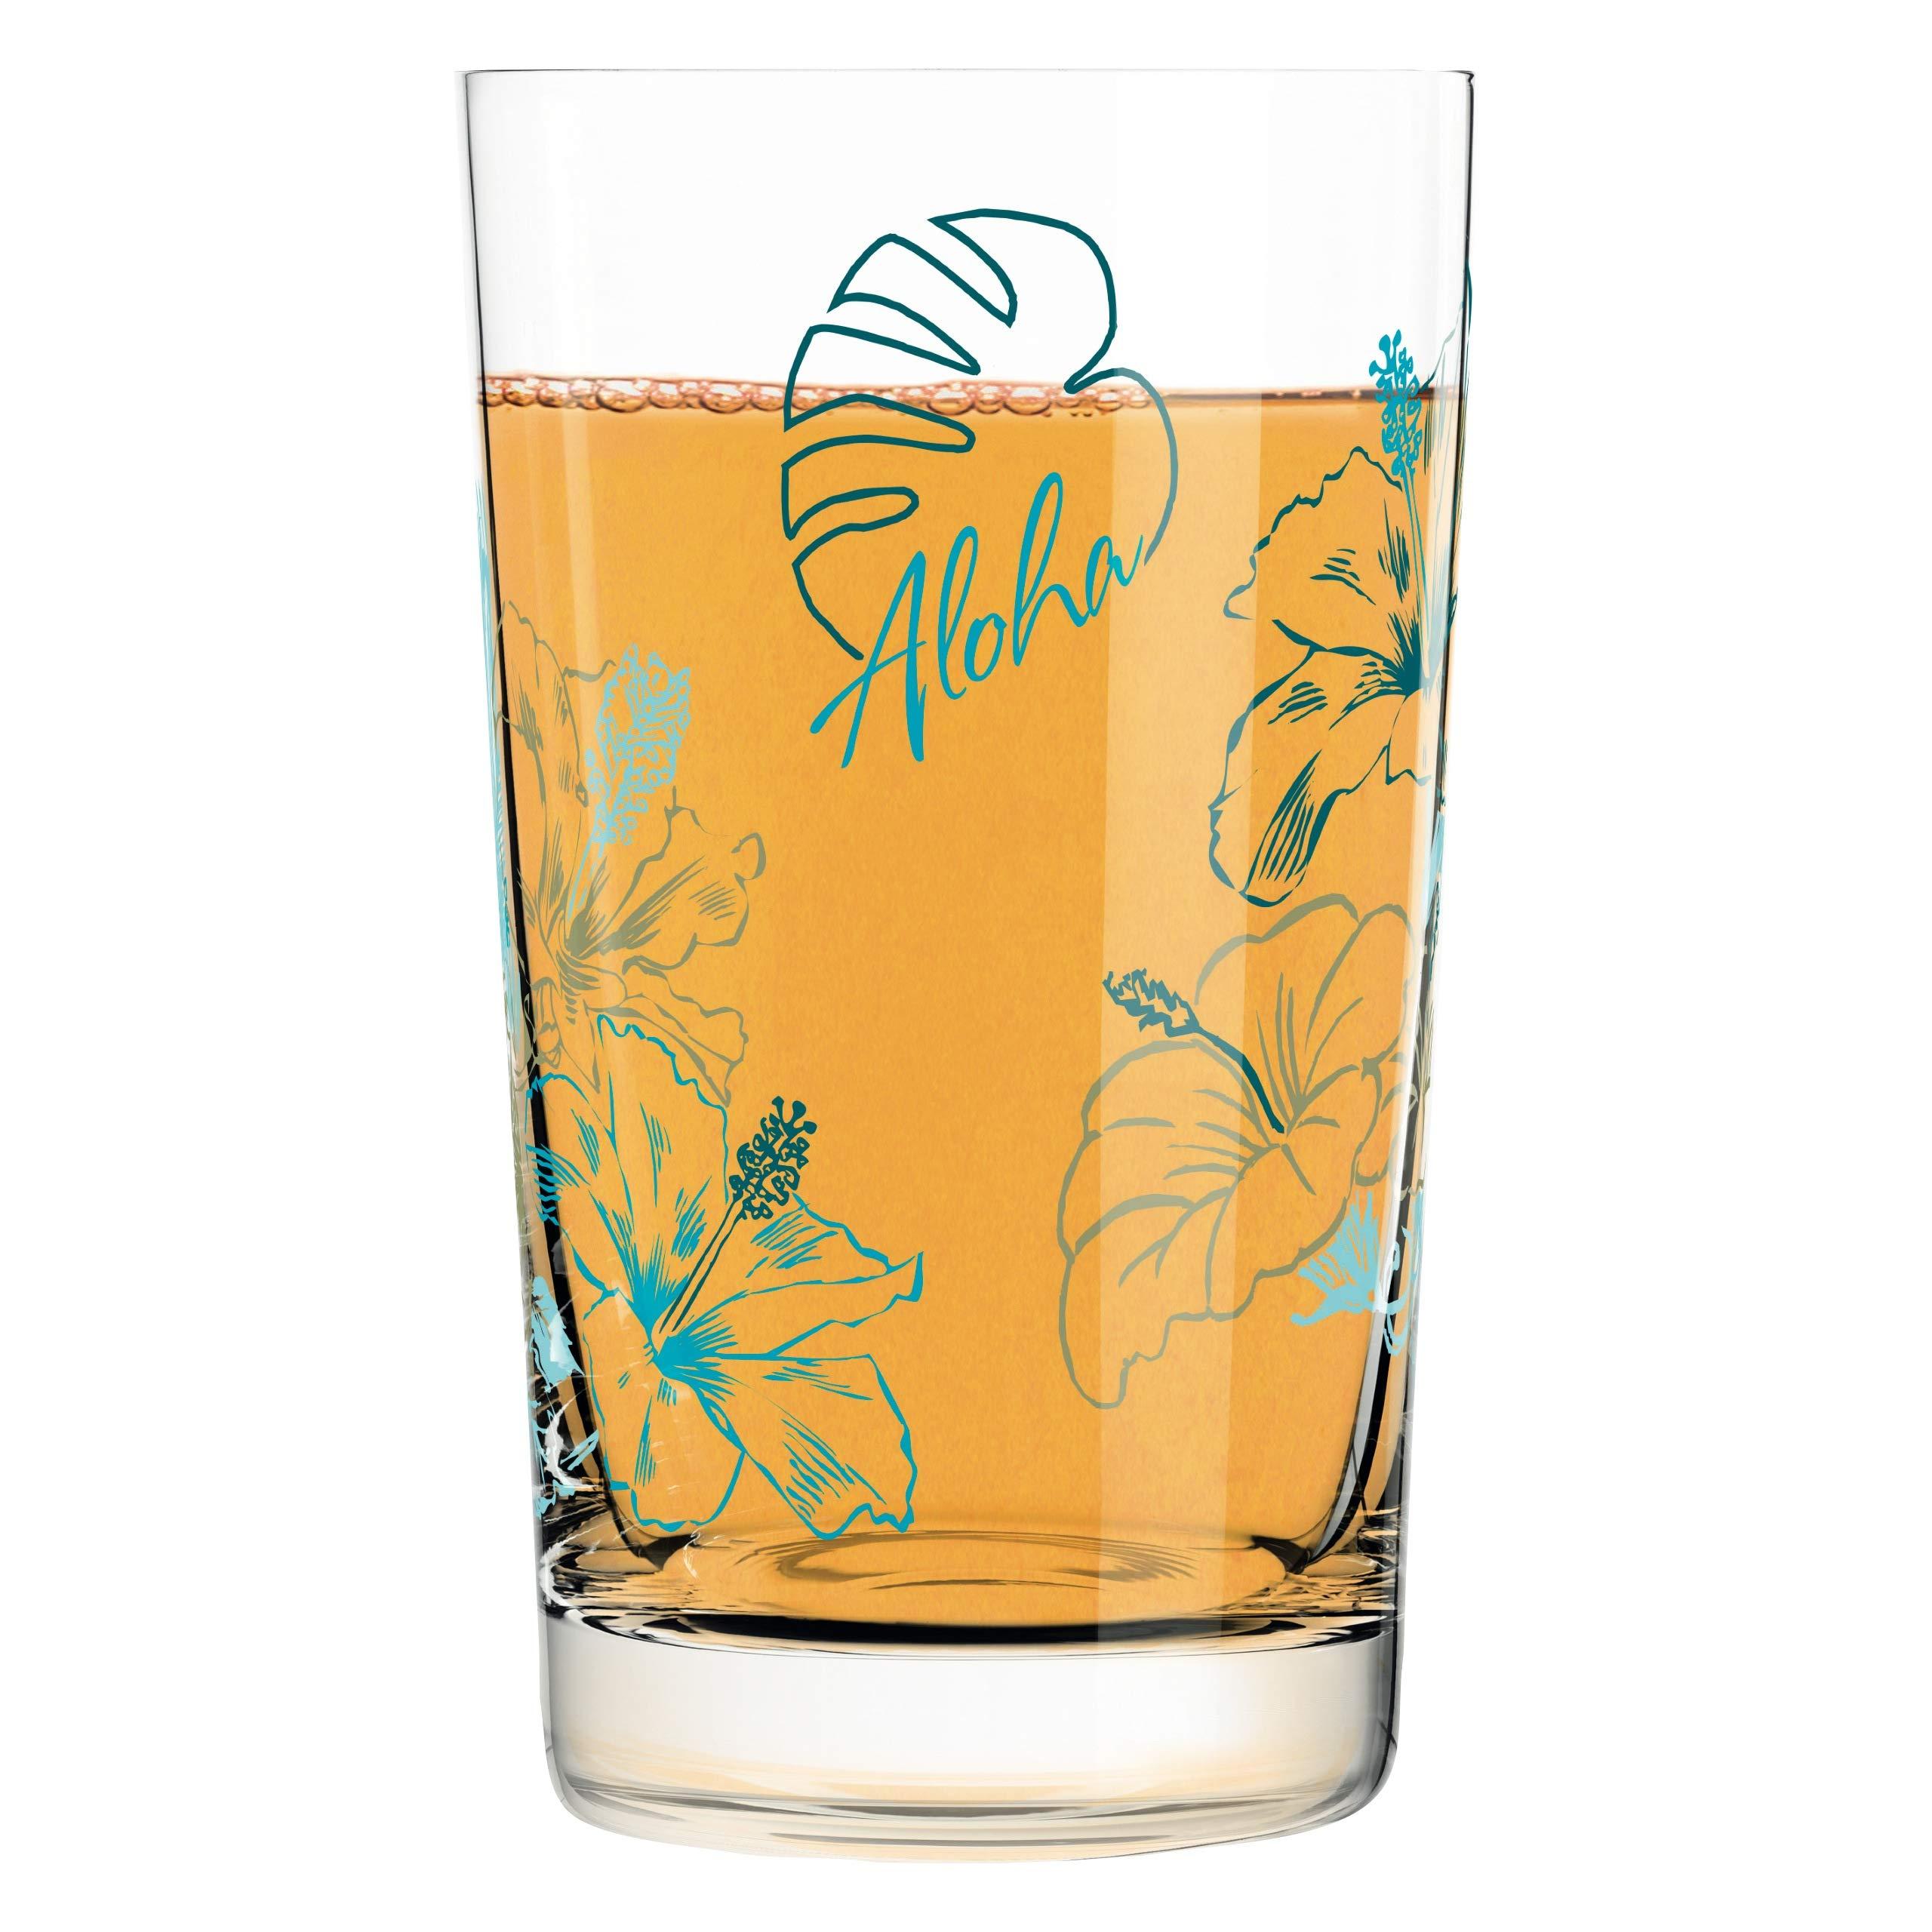 RITZENHOFF Everyday Darling 3270027 Drinking Glass Crystal 300 ml by Ritzenhoff (Image #2)